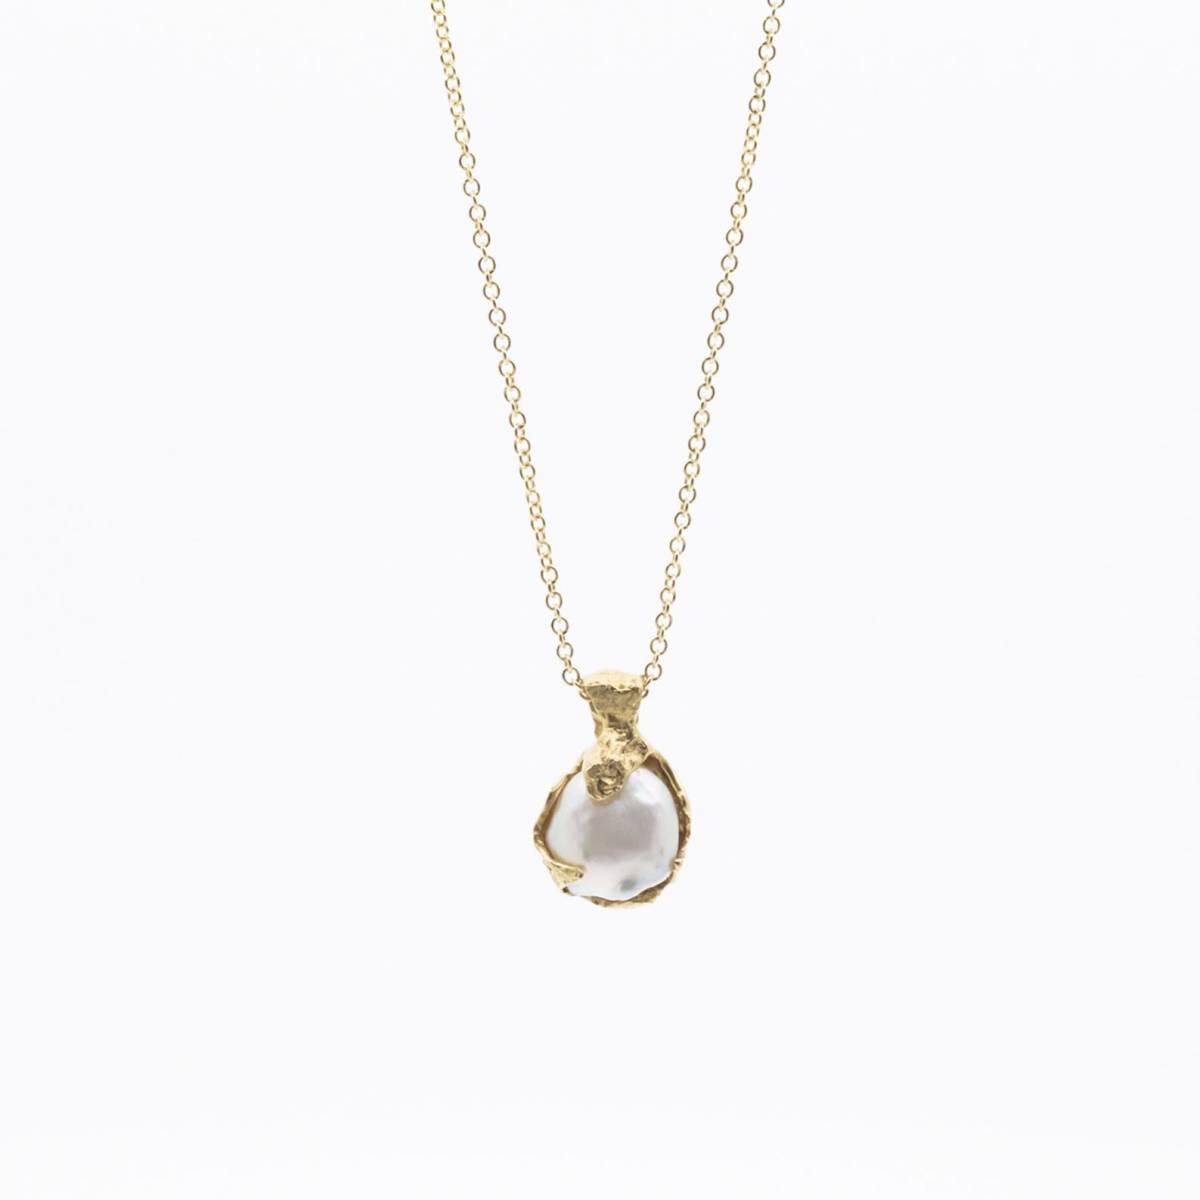 Jonas Maes Jewels - Juwelen - Bruidsjuwelen - Verlovingsring - Trouwring - House of Weddings - 17